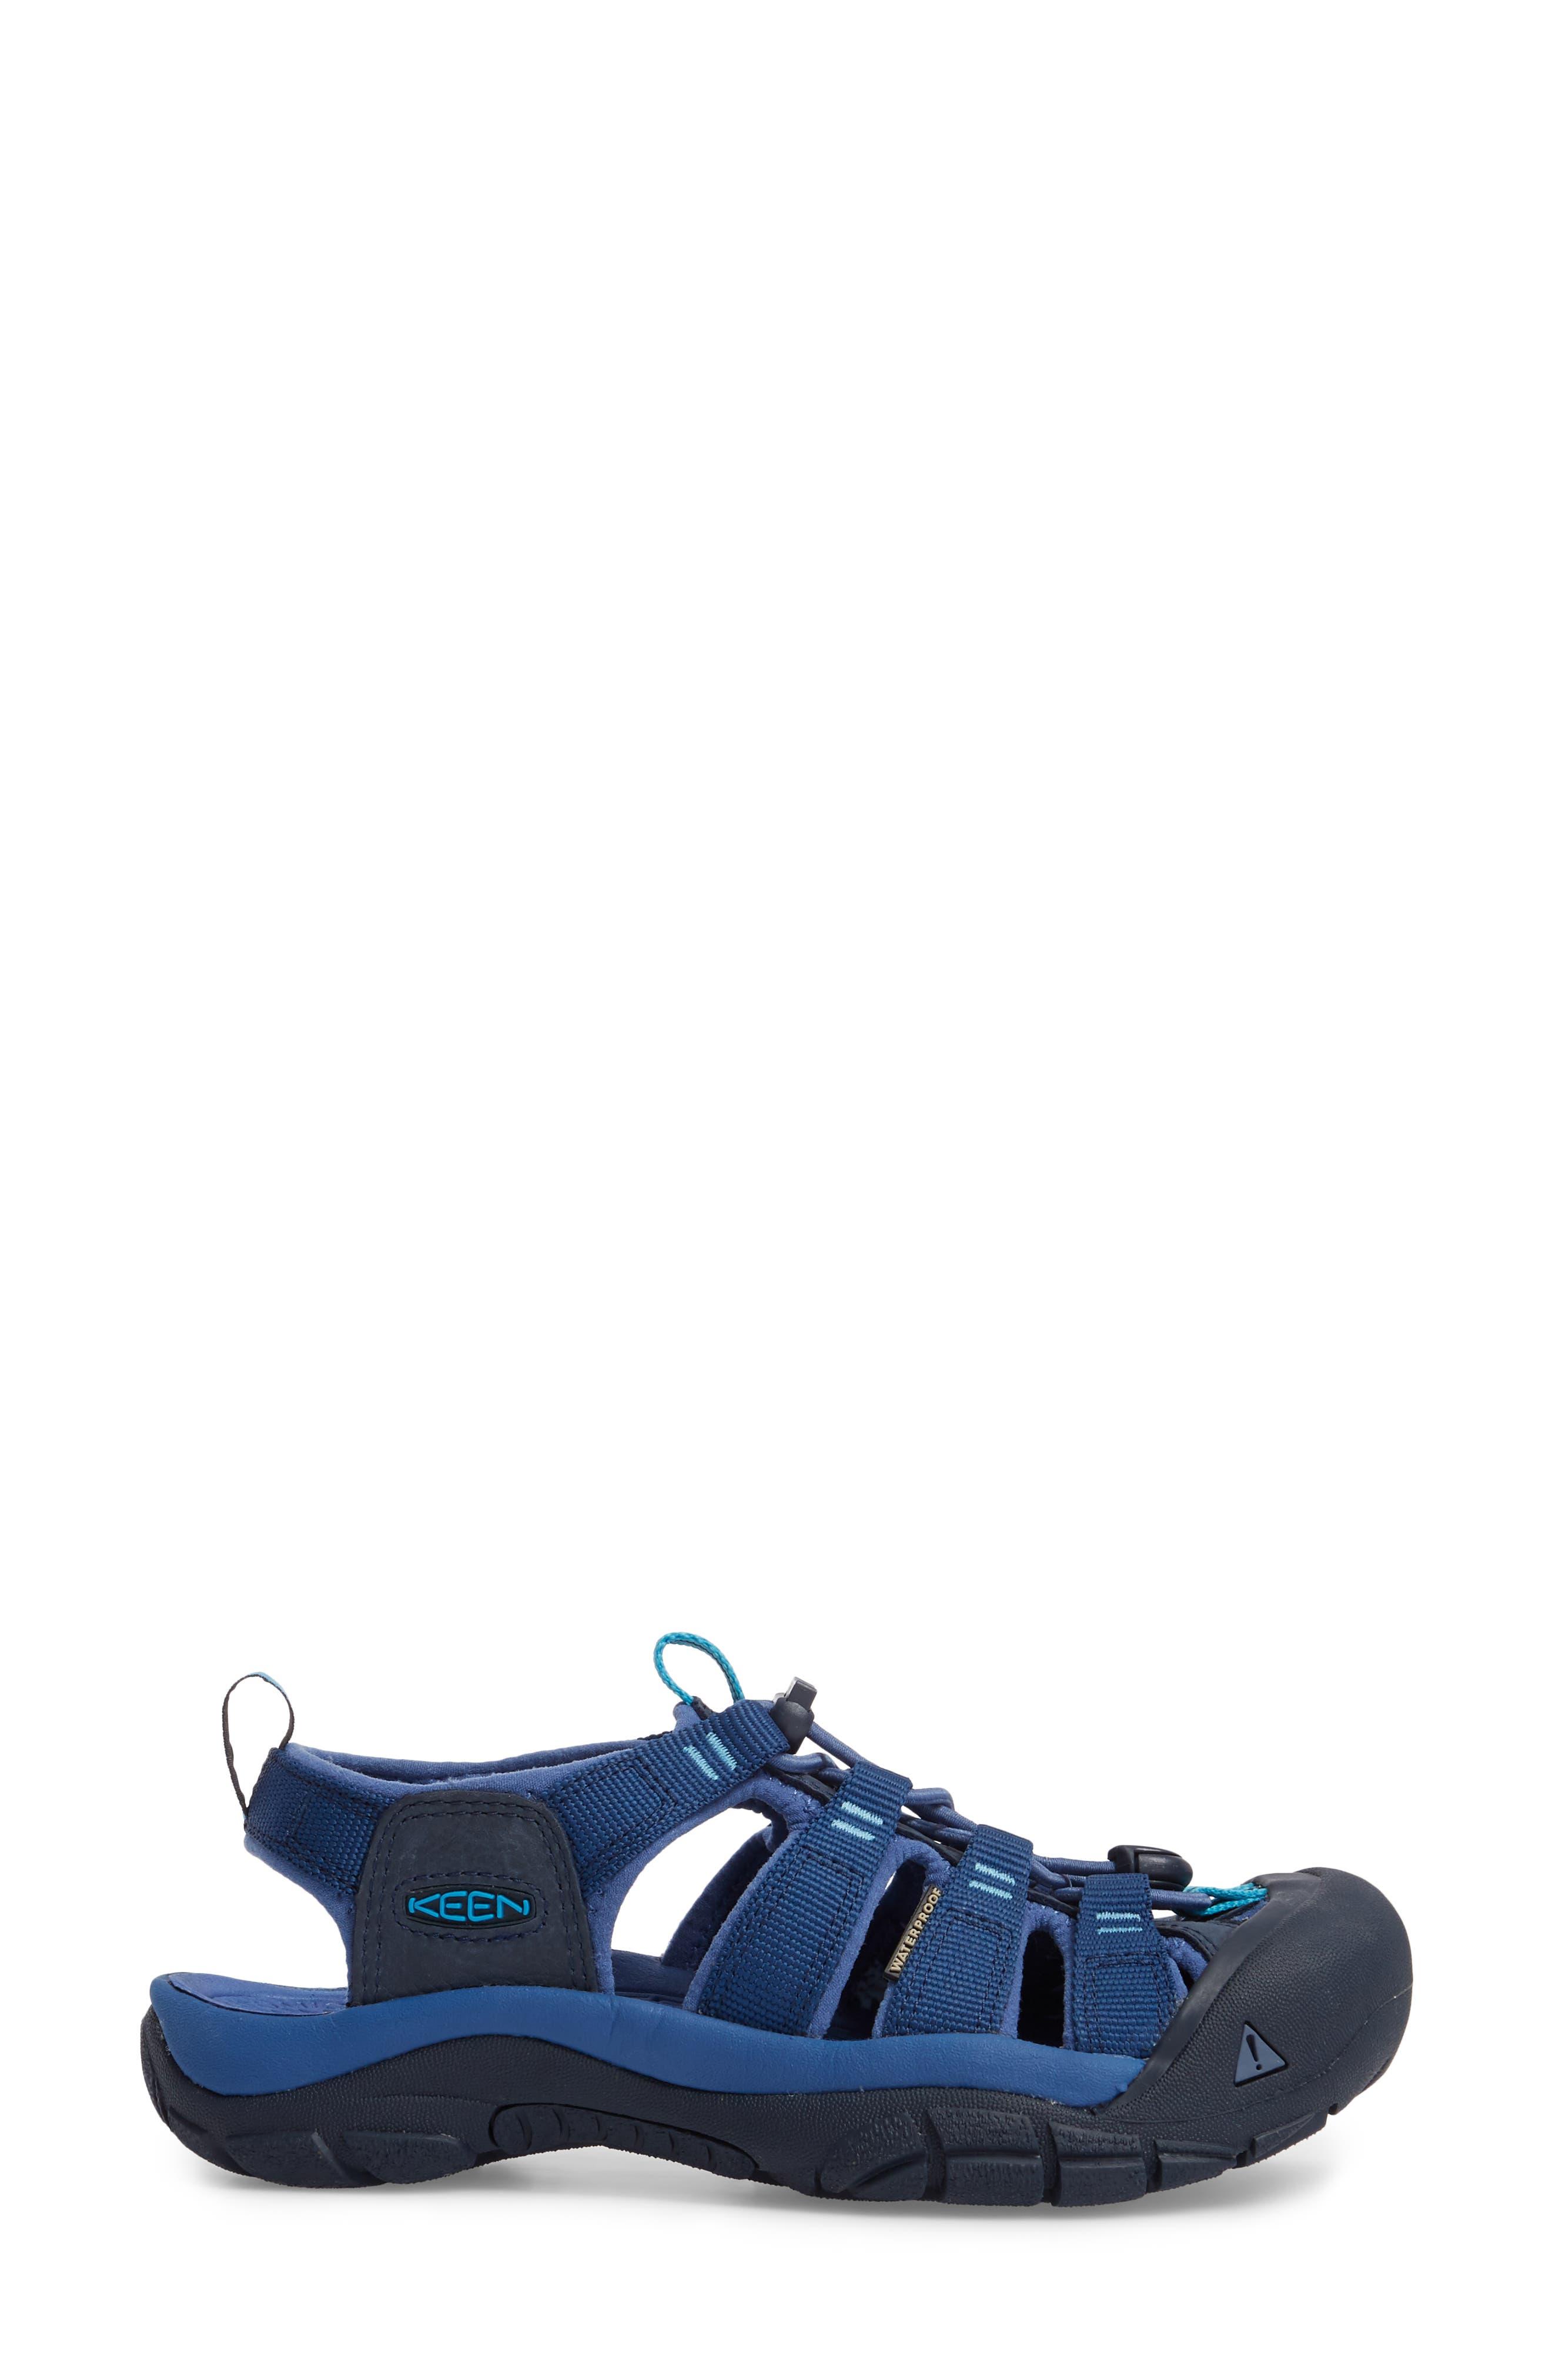 Alternate Image 3  - Keen Newport Eco Waterproof Sandal (Women)